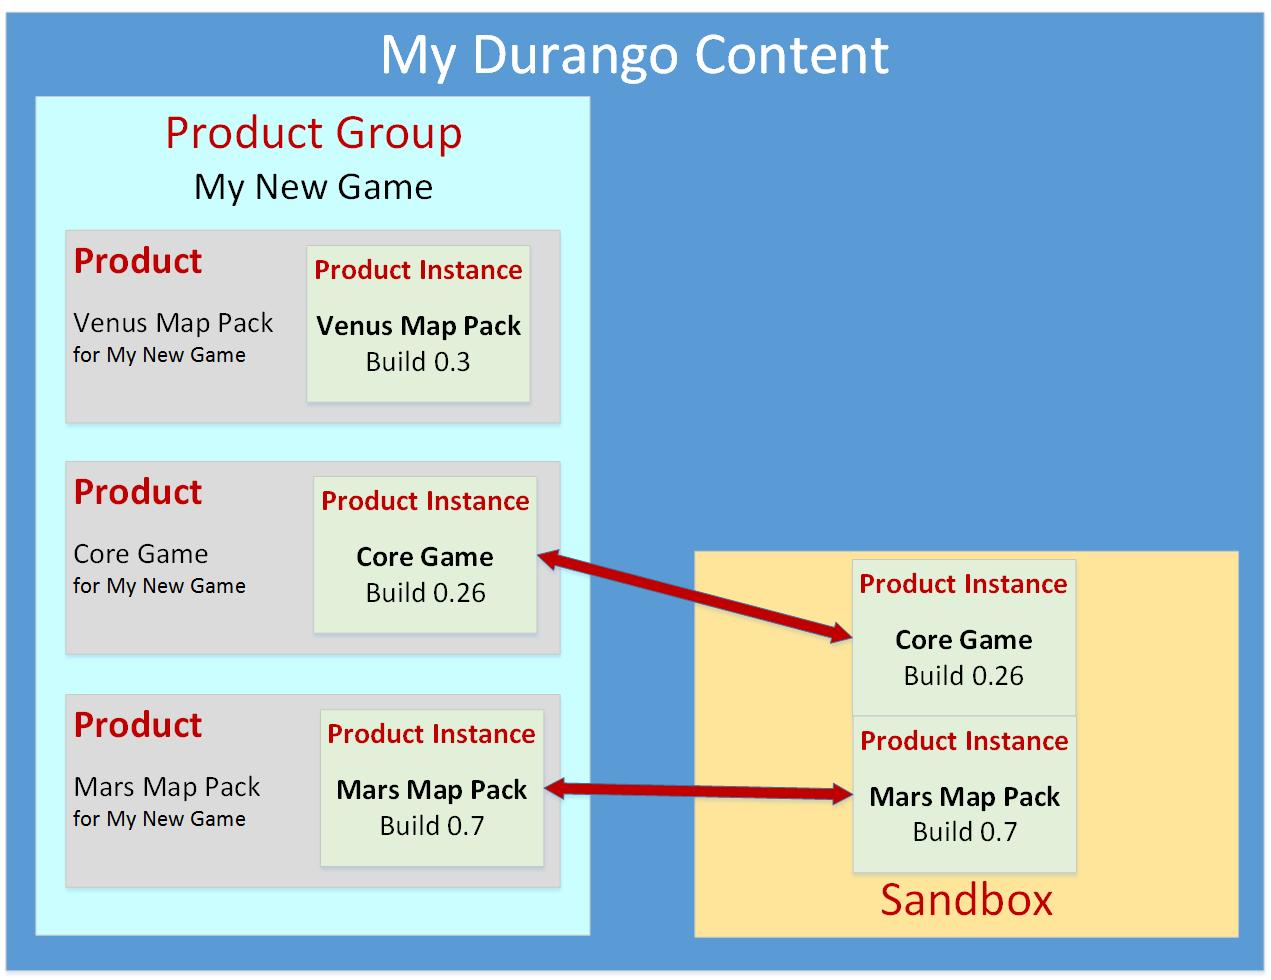 Advanced Xbox Live sandboxes - UWP app developer   Microsoft Docs